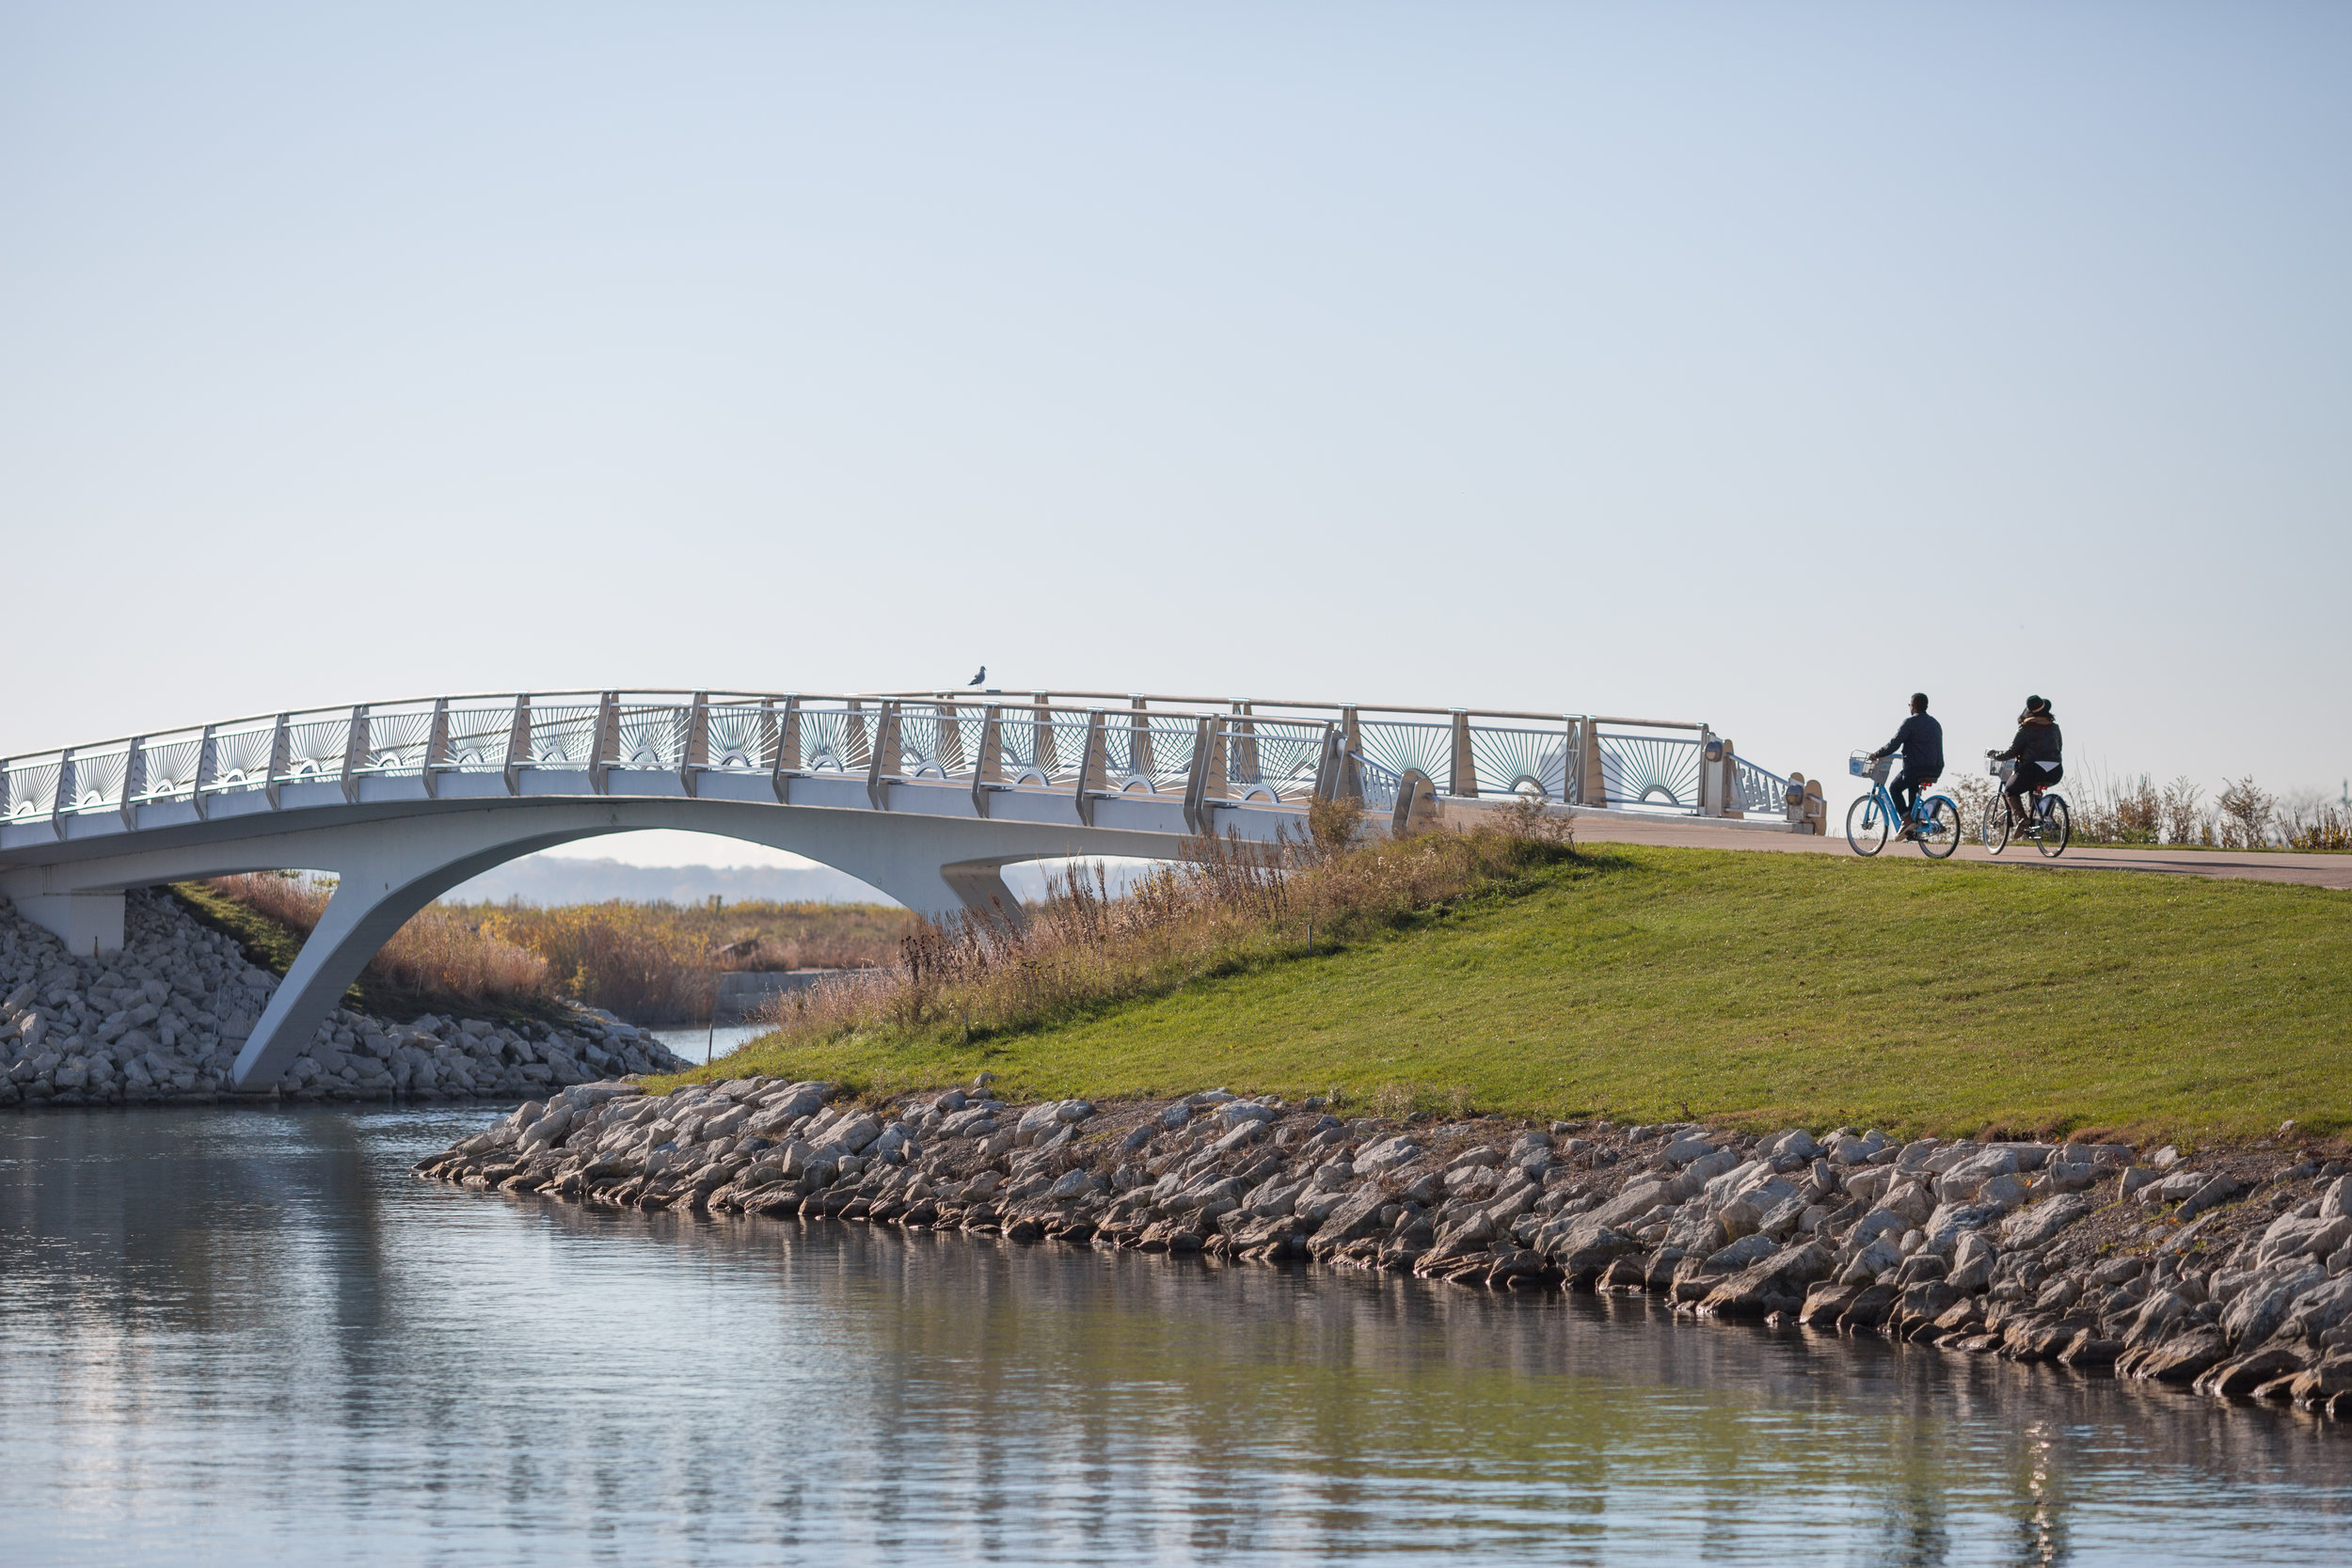 VM_lakefront_biking_Fall15_0473.jpg